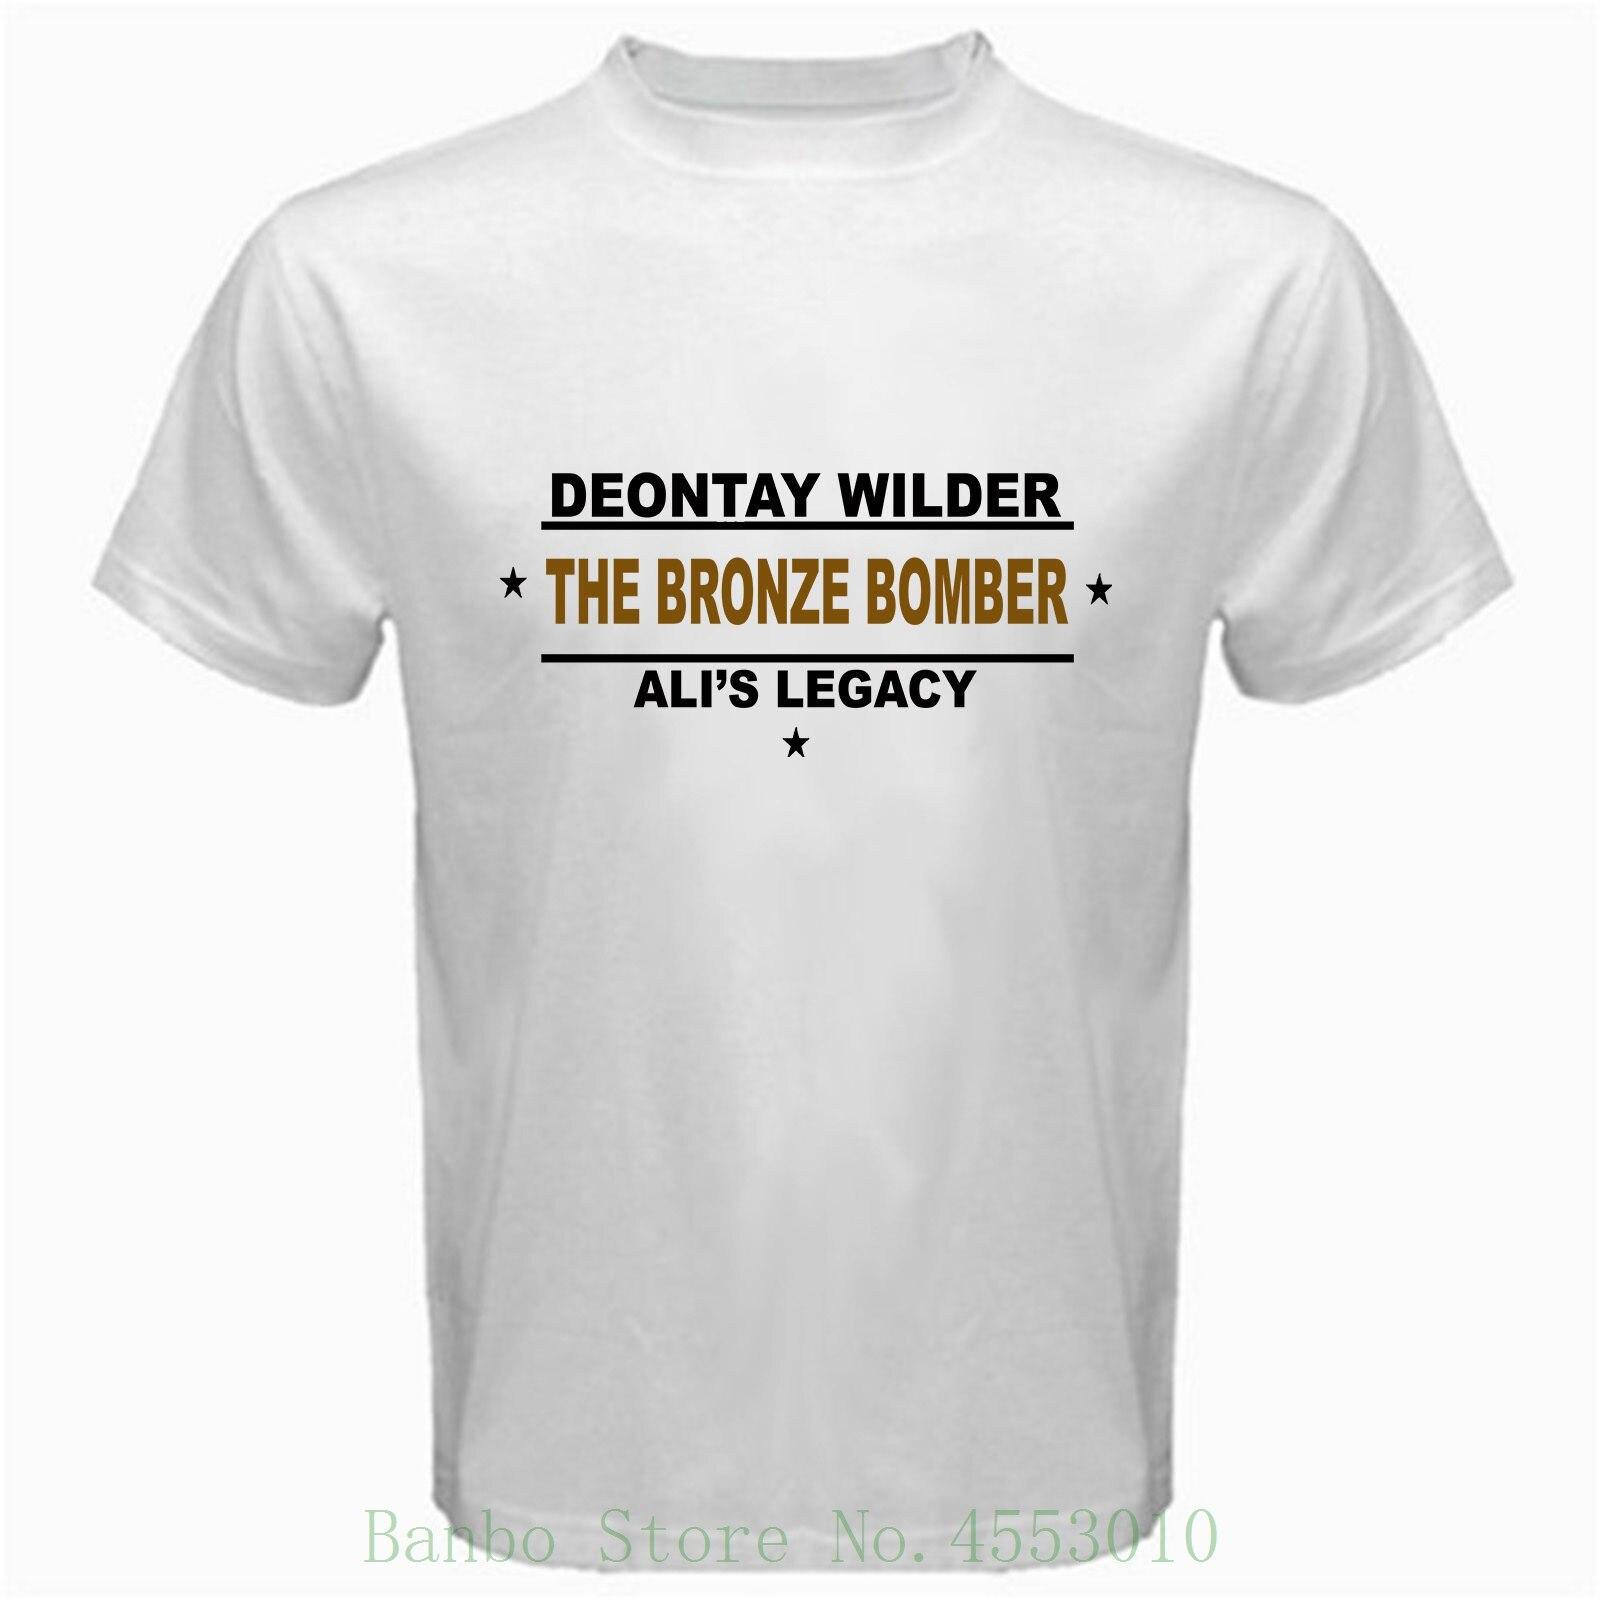 Deontay Wilder The Bronze Bomber Ali's Legacy Heavyweight Champ Tshirt White New 2018 Summer Fashion